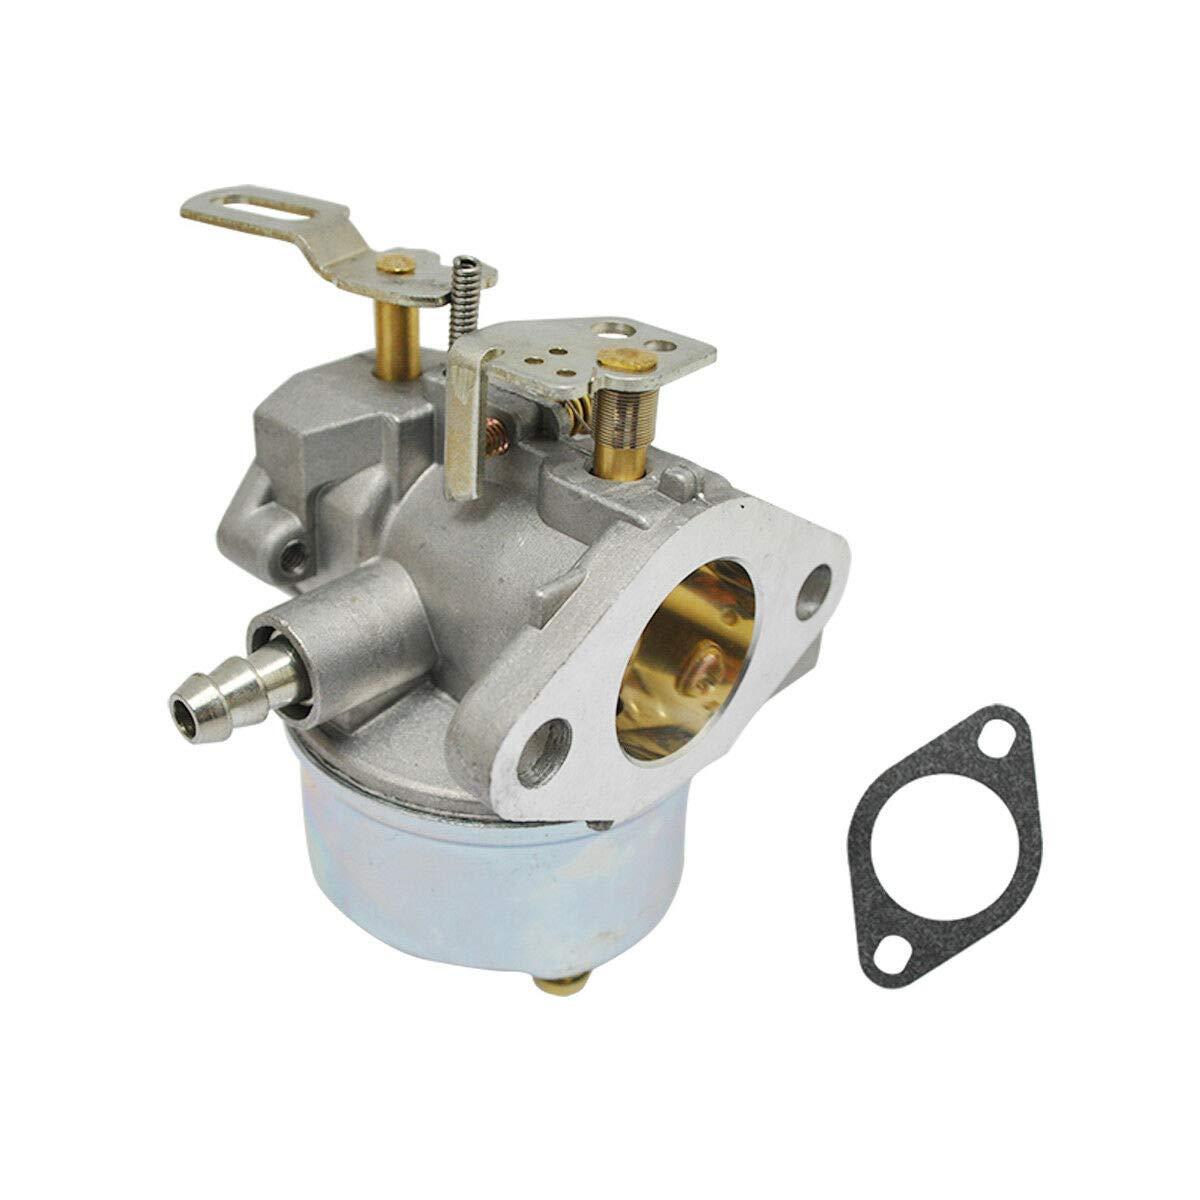 FidgetKute Carburetor Gasket Kit Tecumseh 632334A 632334 for HM70 HM80 HMSK80 HMSK90 CARB